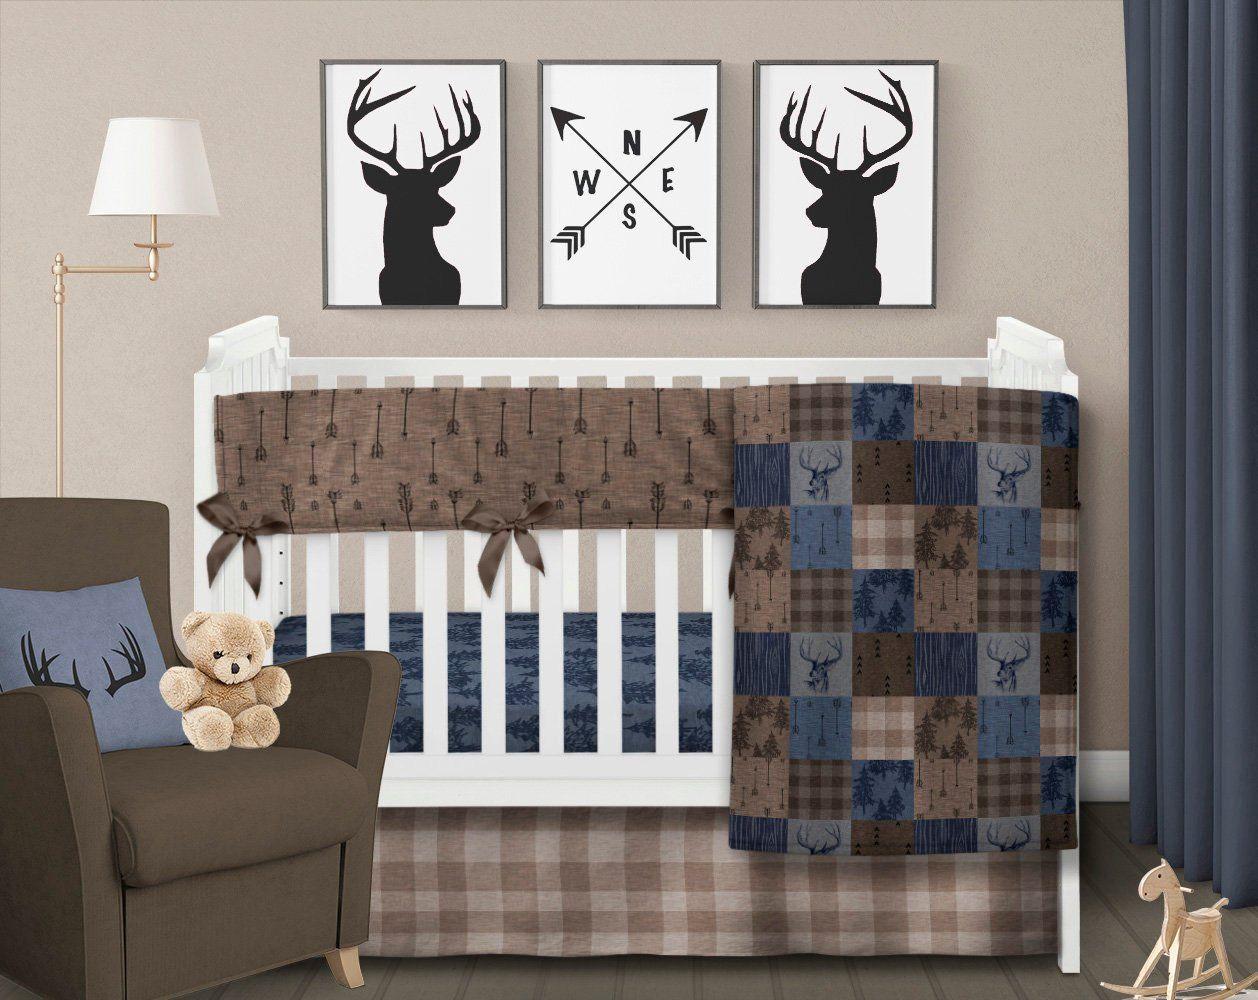 Rustic Crib Bedding Set Boy Nursery Bedding Deer Crib Bedding Plaid Baby Blanket Navy Blue Bro Boy Nursery Bedding Baby Crib Bedding Sets Deer Crib Bedding